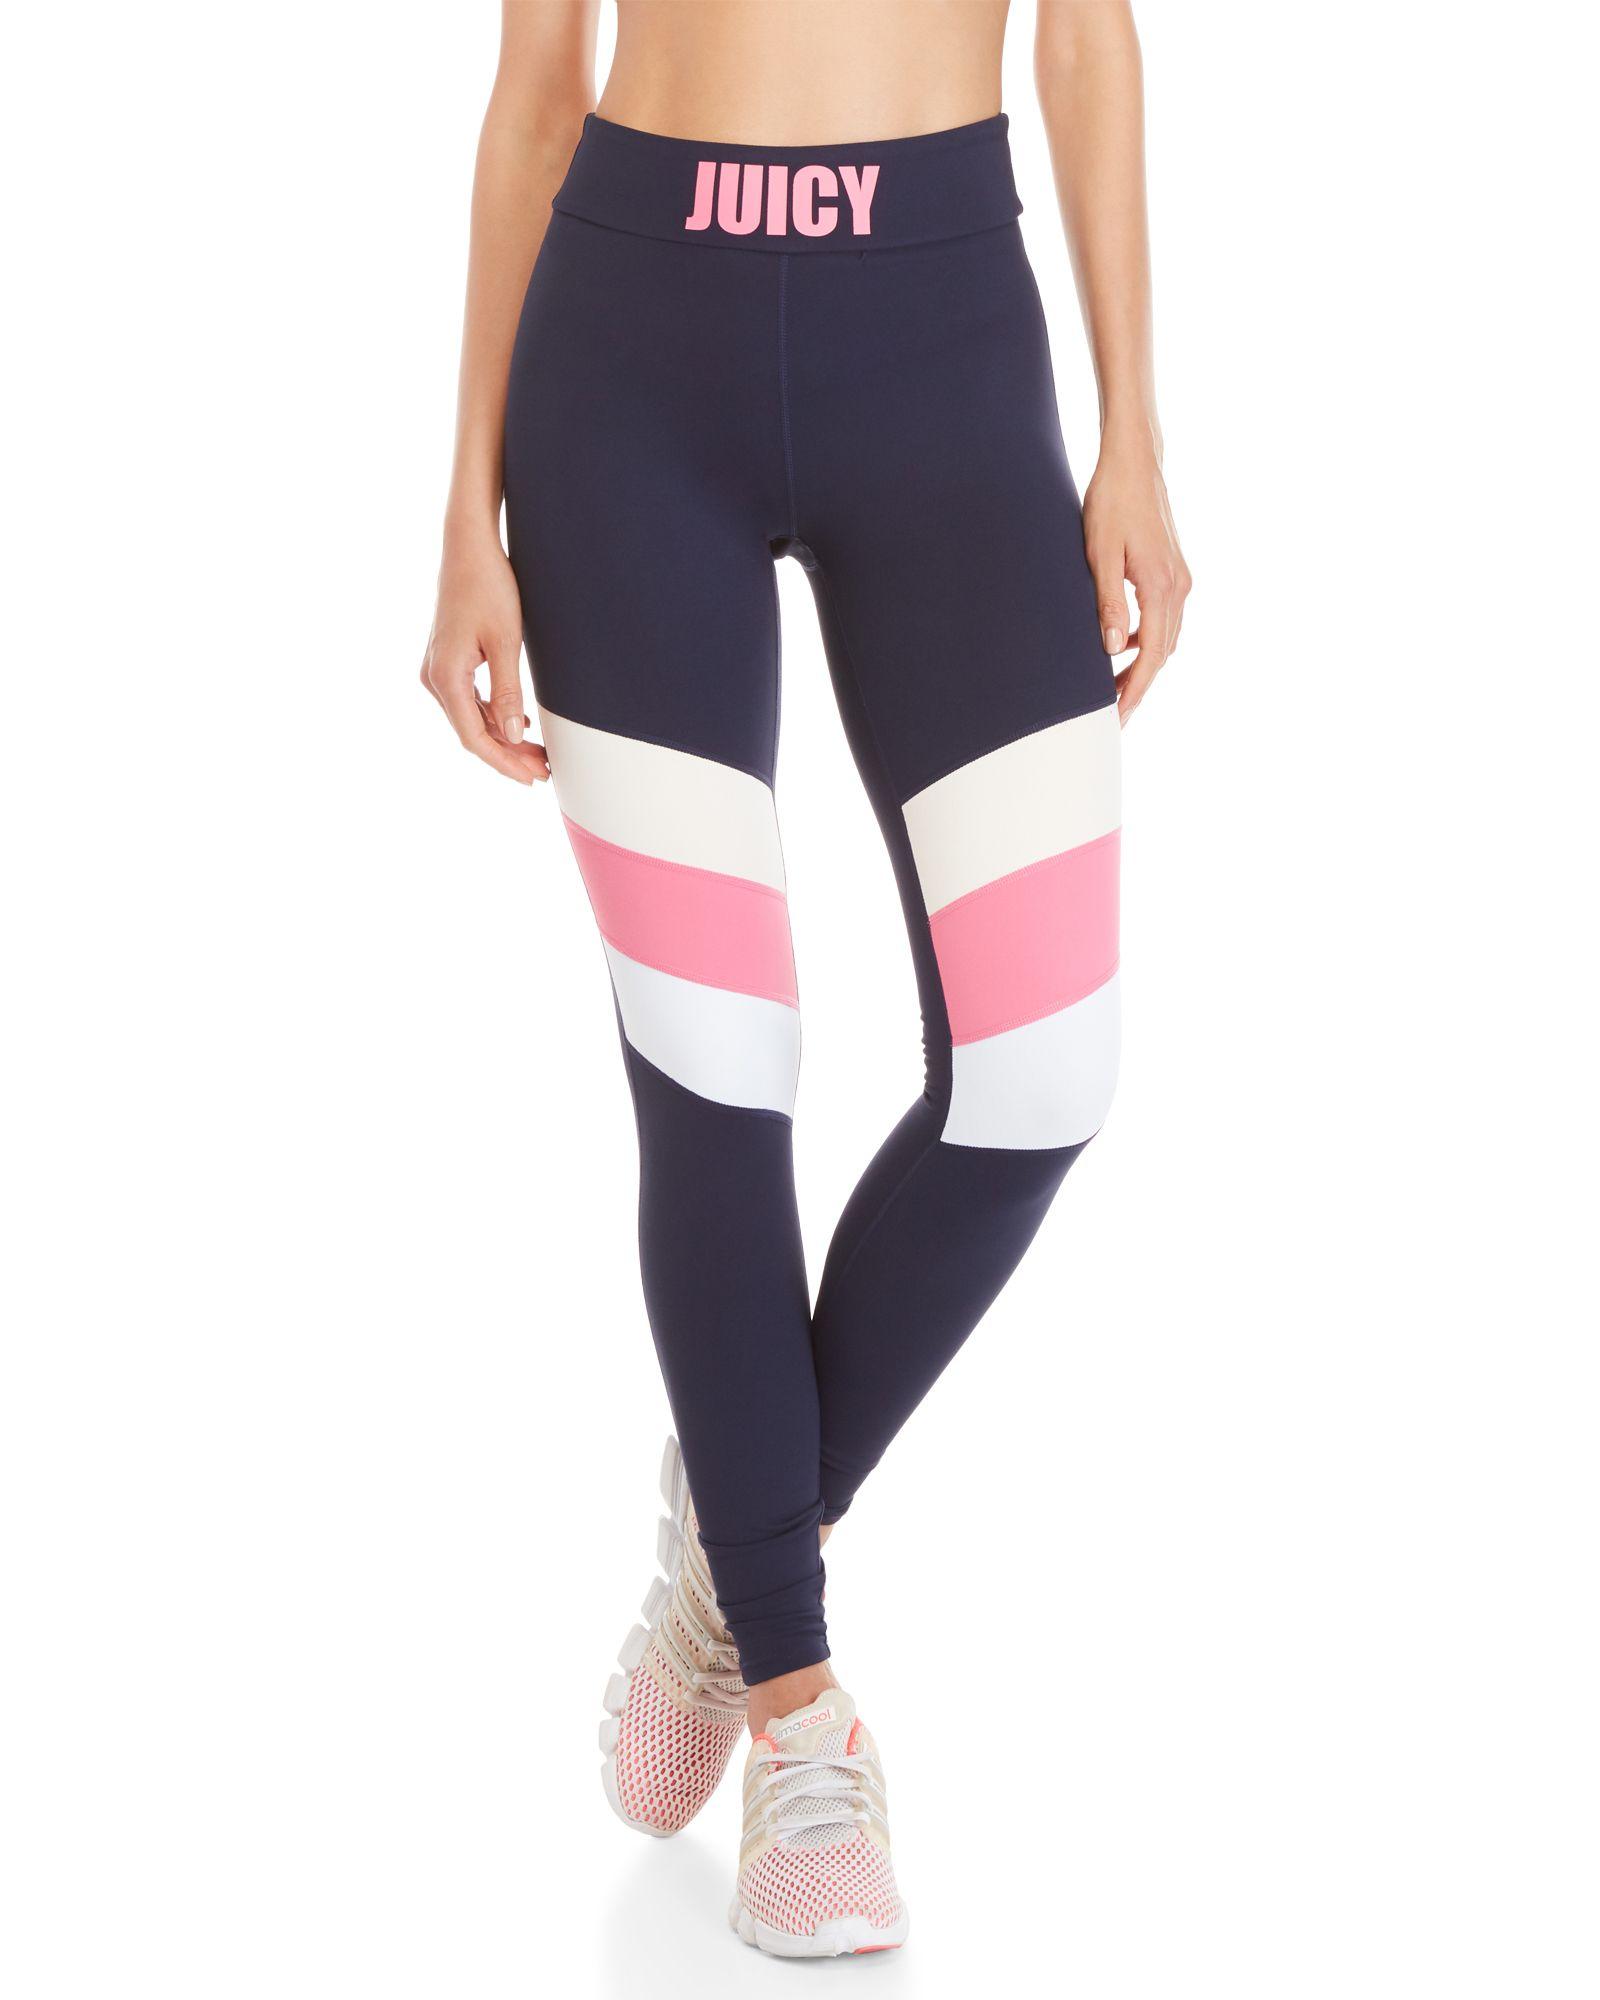 8335f47ae2 Juicy Couture Color Block Sport Leggings | *Apparel & Accessories ...